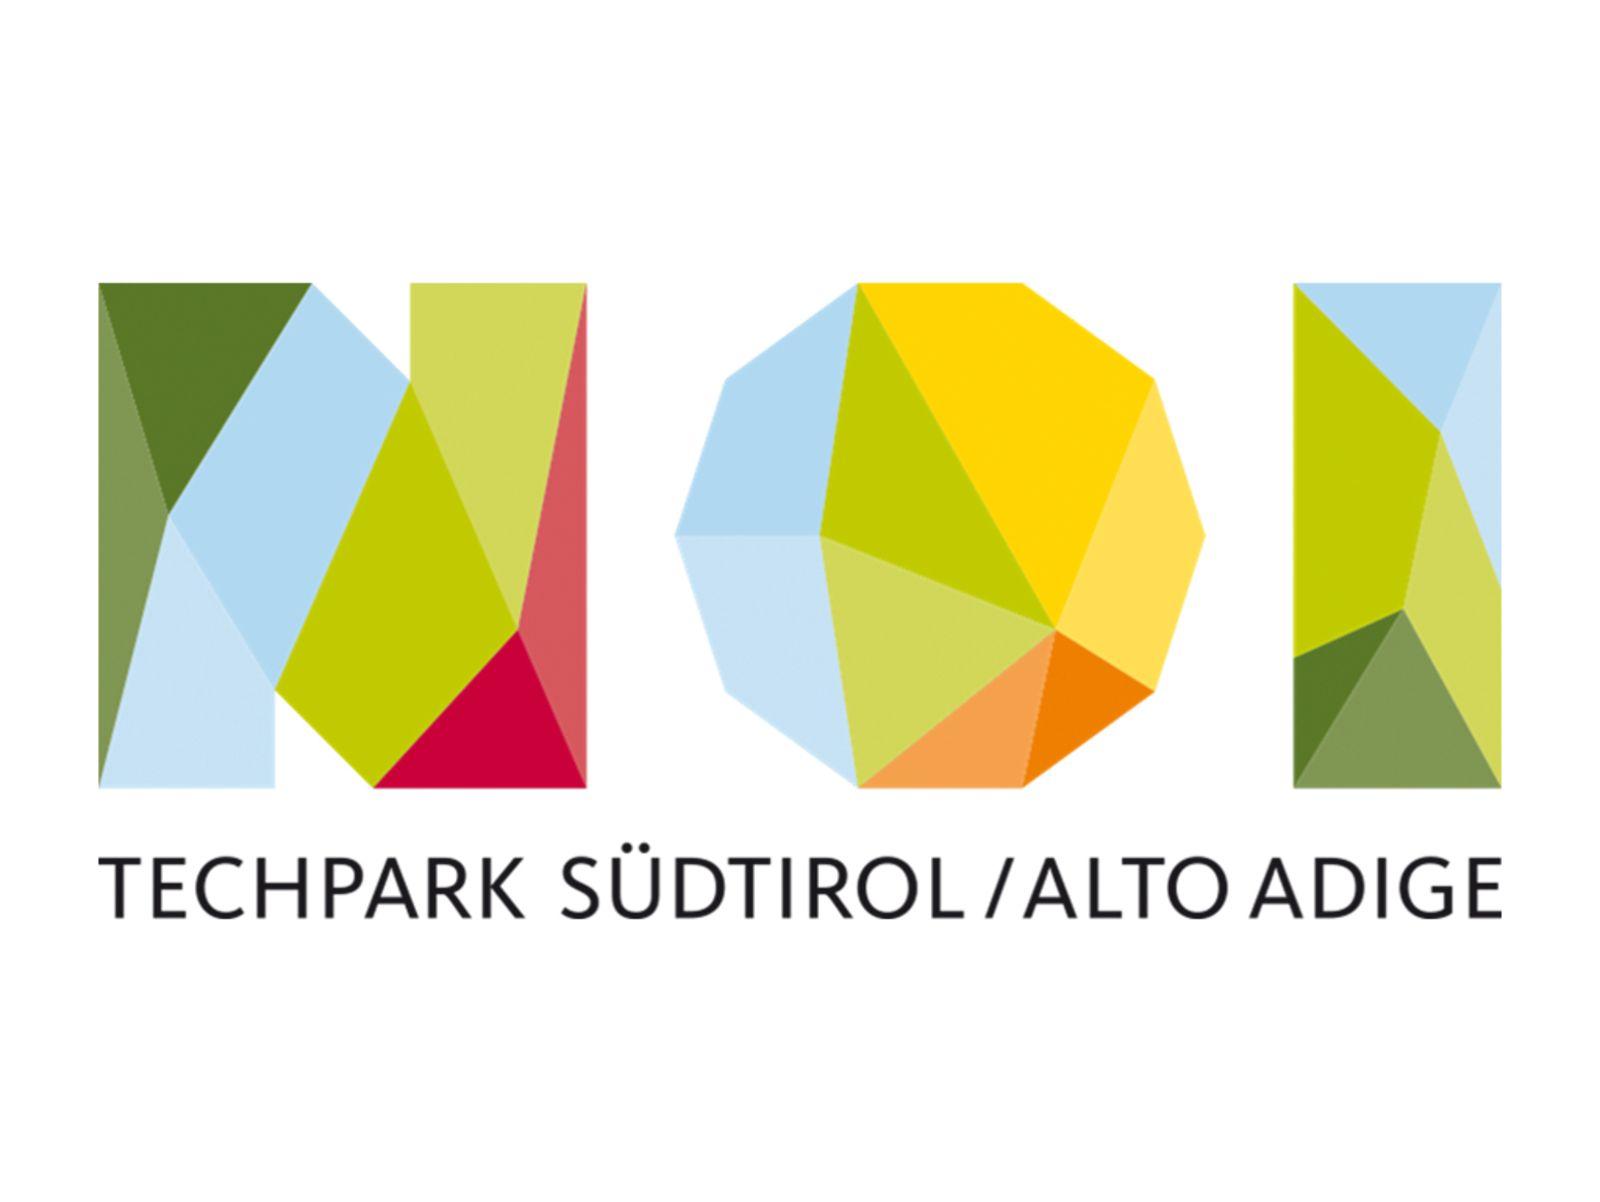 NOI techpark logo